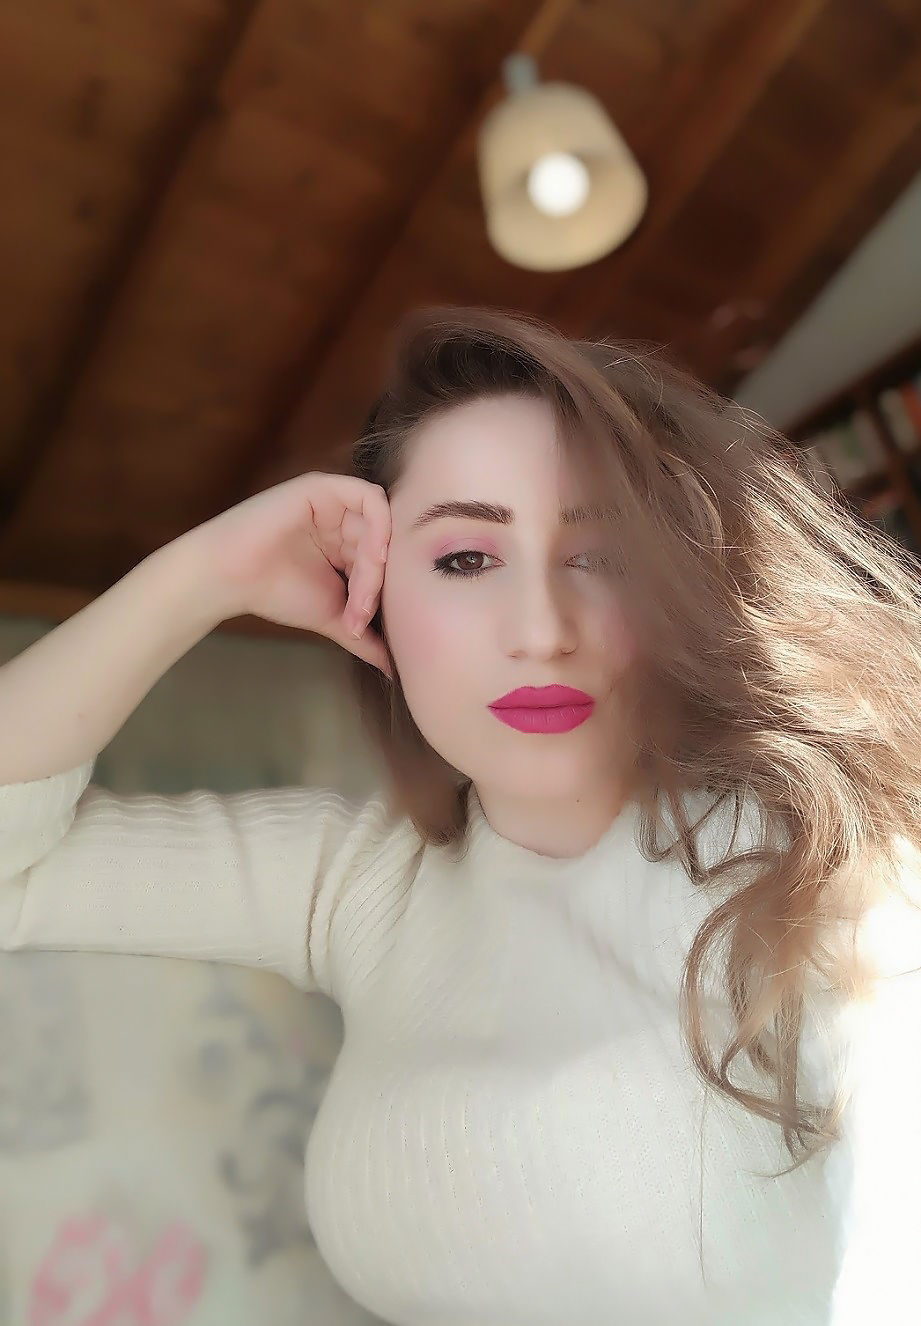 lorena-stroka-biografia-kush-eshte-foto-instagram-gazetare-albstroka-facebook-books